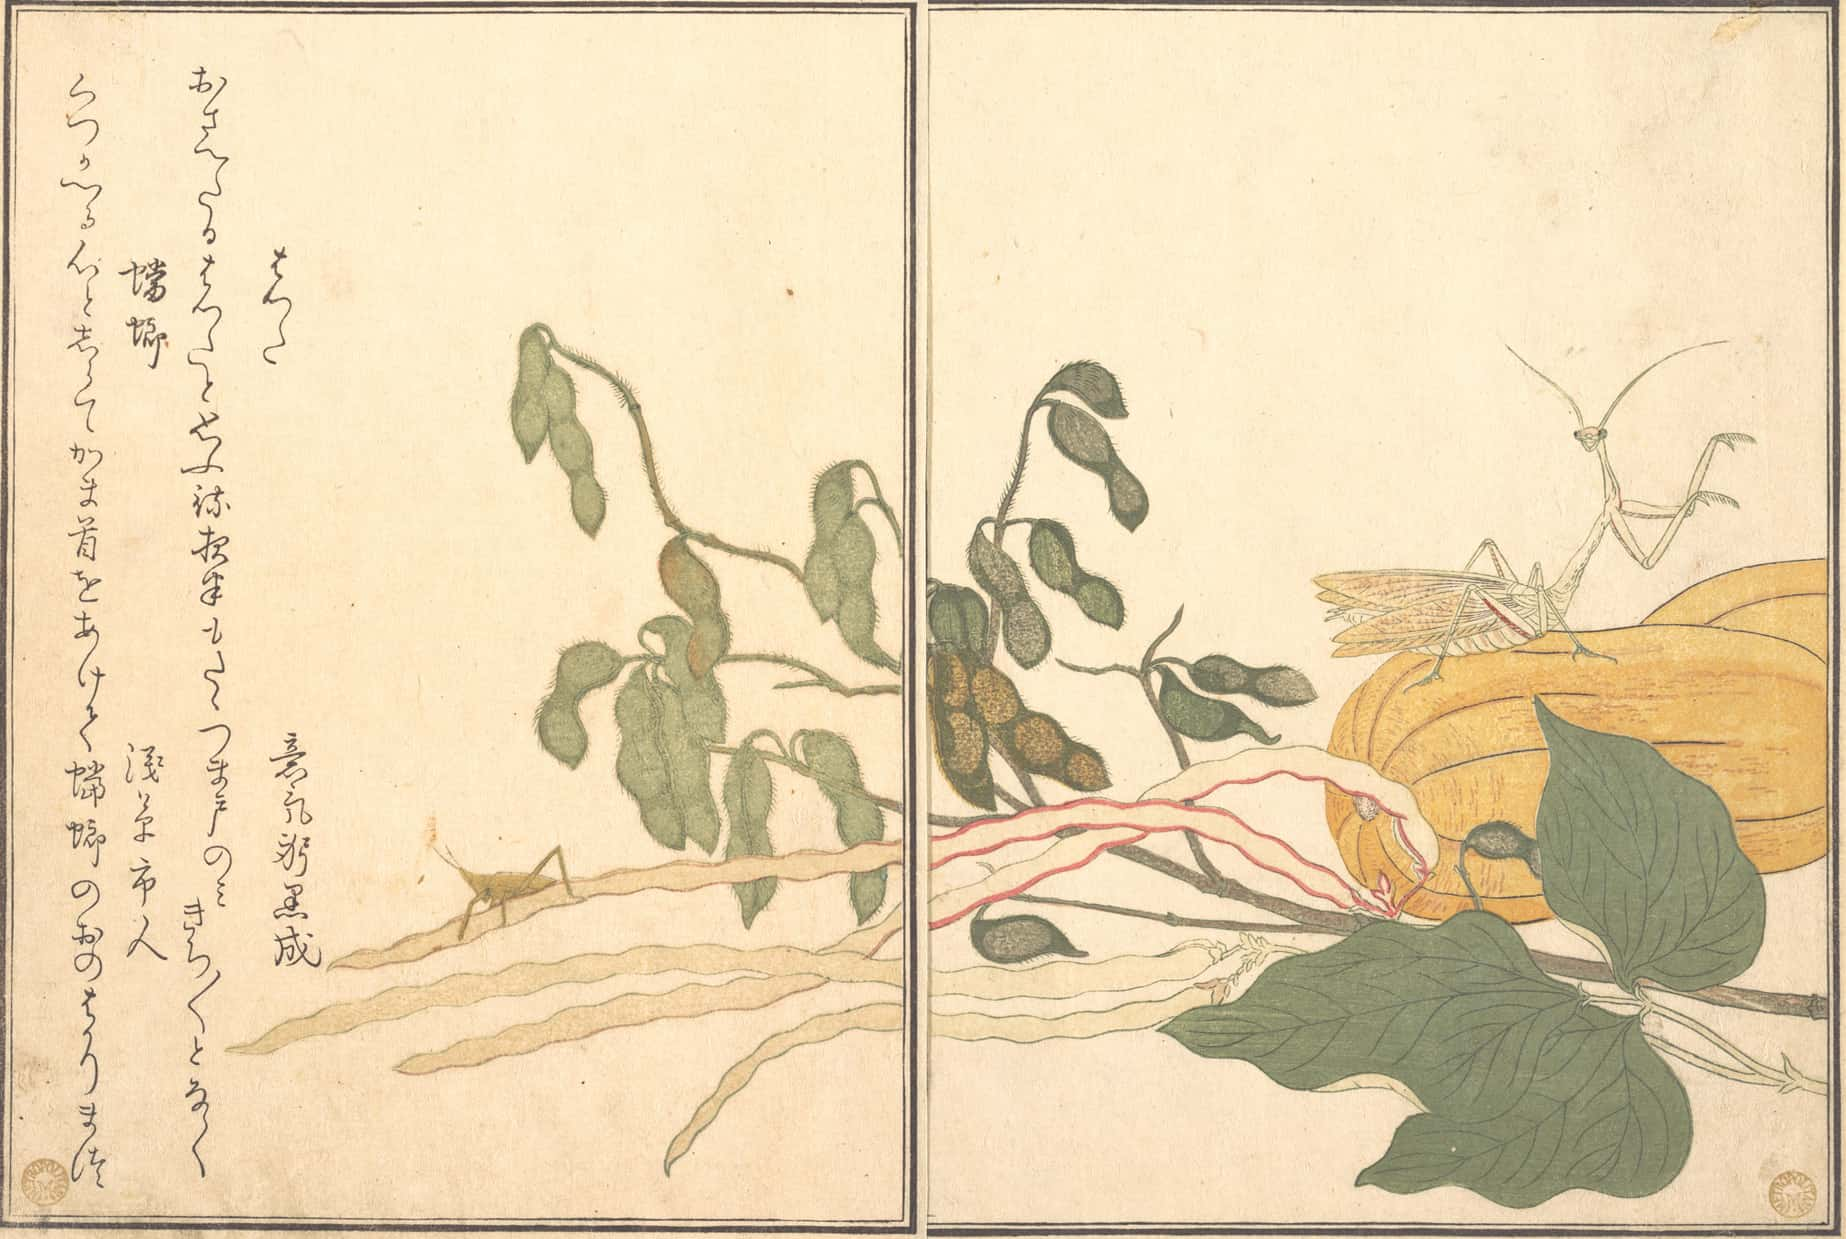 Praying Mantis and Cone-headed Grasshopper, Kitagawa Utamaro, c.1788,kacho-e